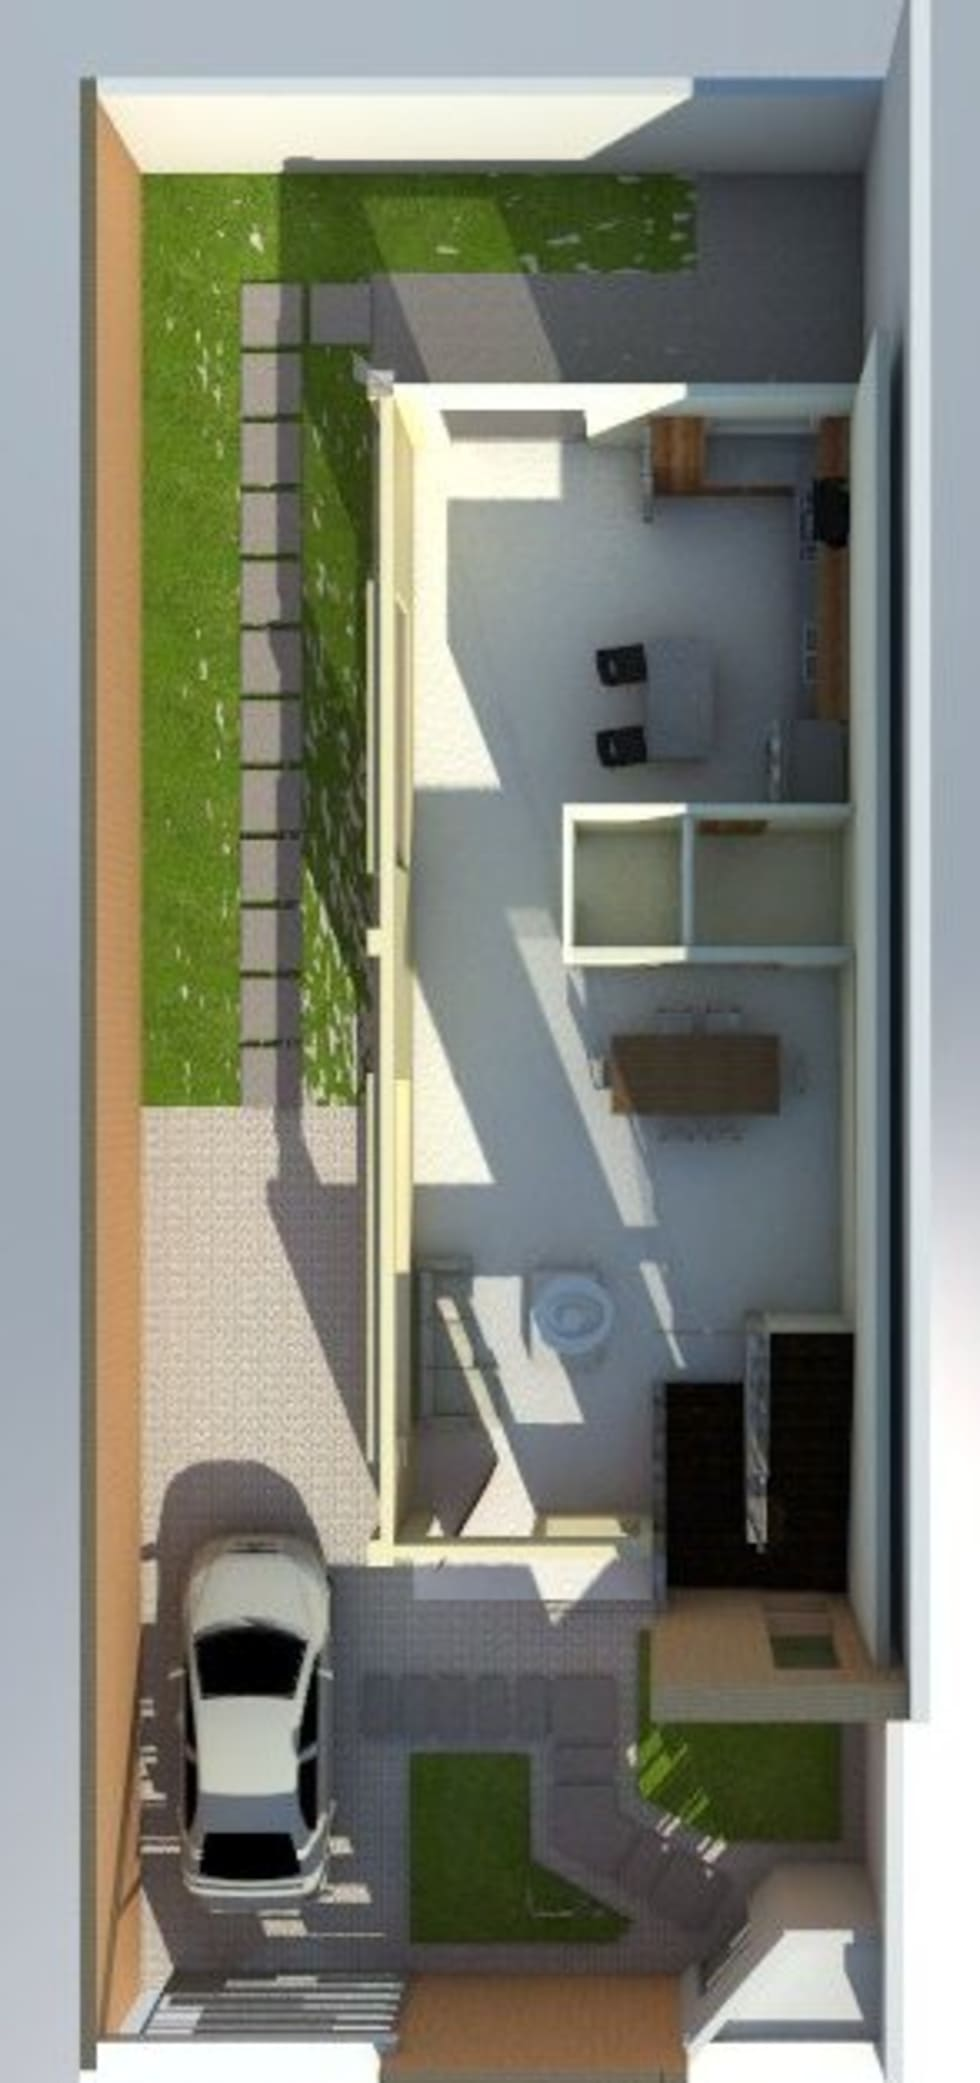 Planta baja de vivienda unifamiliar FAMILIA SANABRIA: Salas / recibidores de estilo minimalista por 3R. ARQUITECTURA